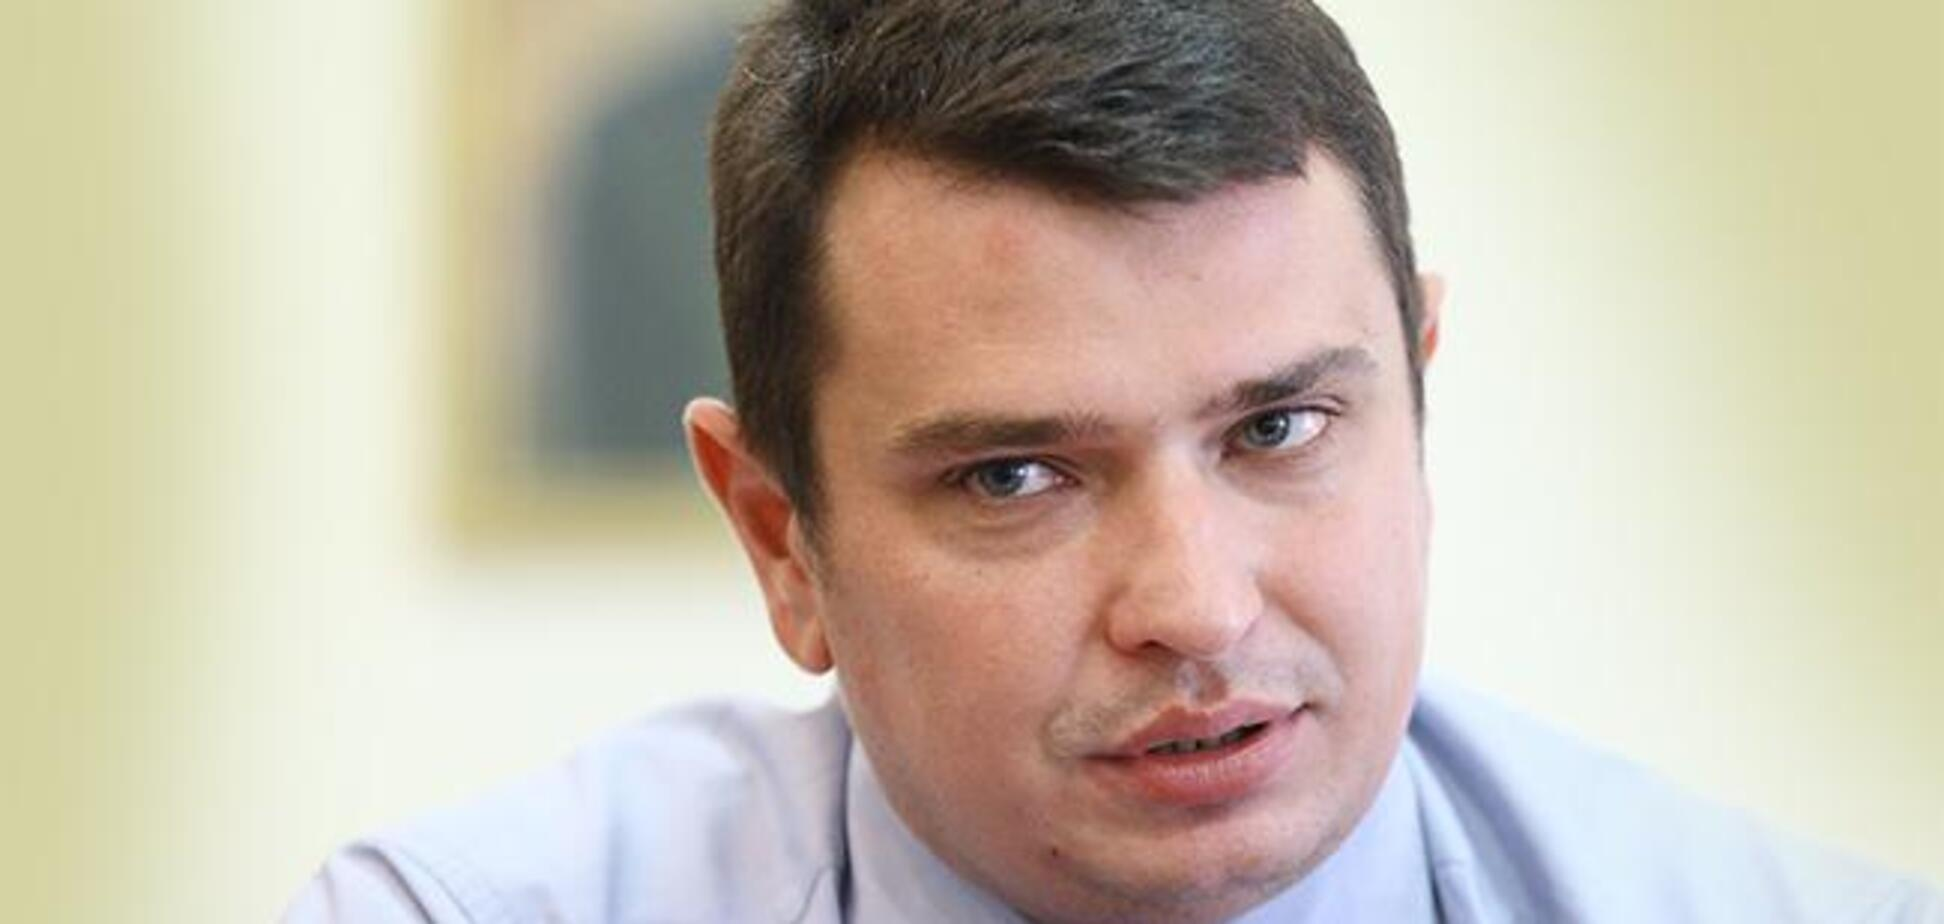 Суд наложил штраф на директора НАБУ Сытника